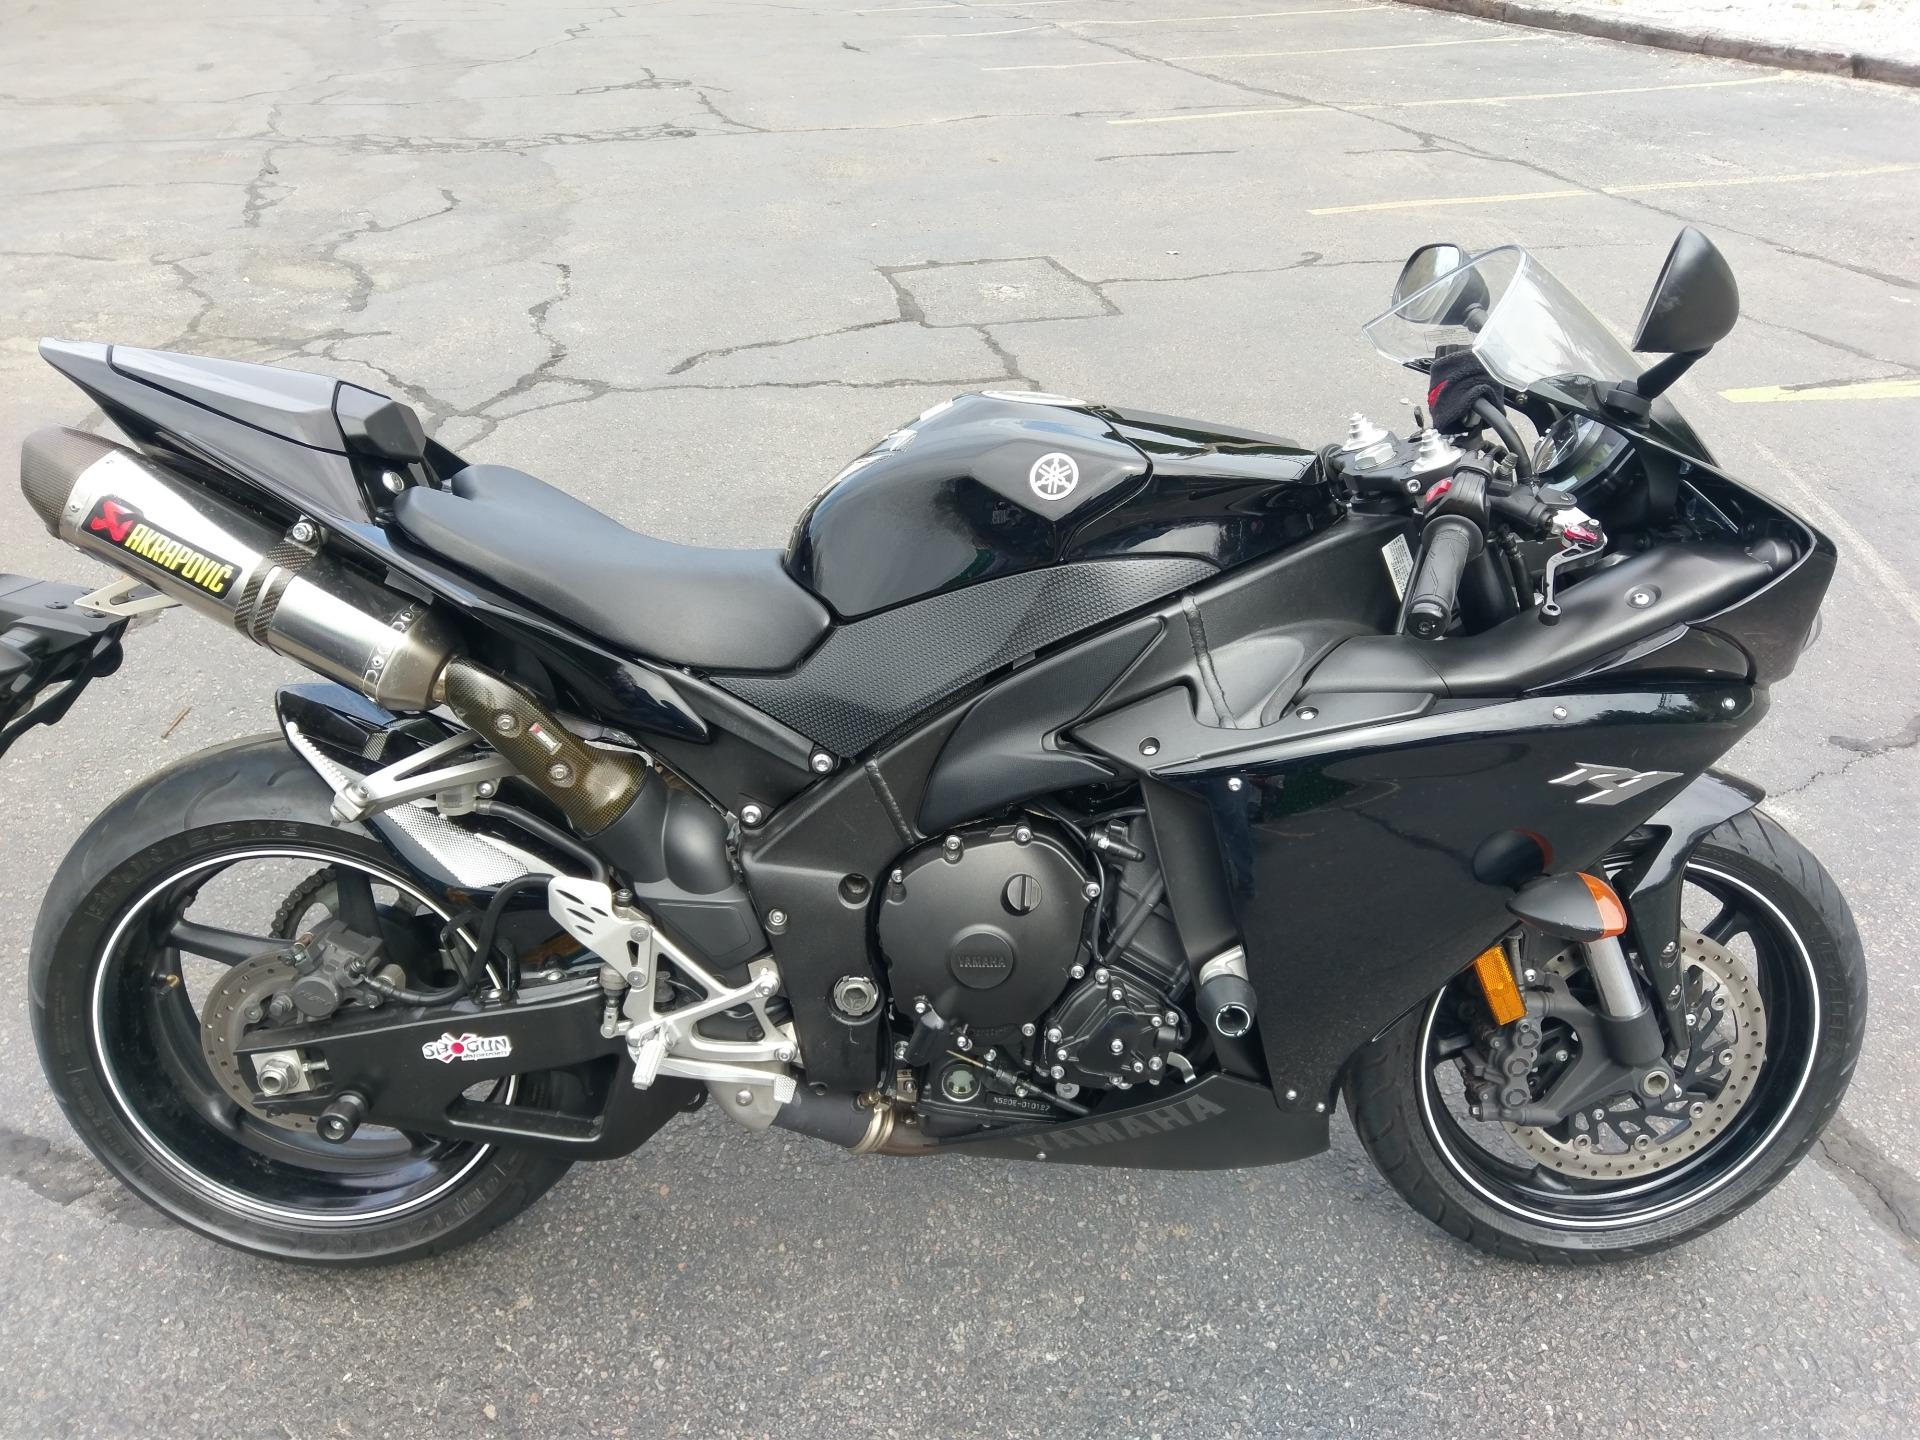 2010 Yamaha YZF-R1 for sale 157367